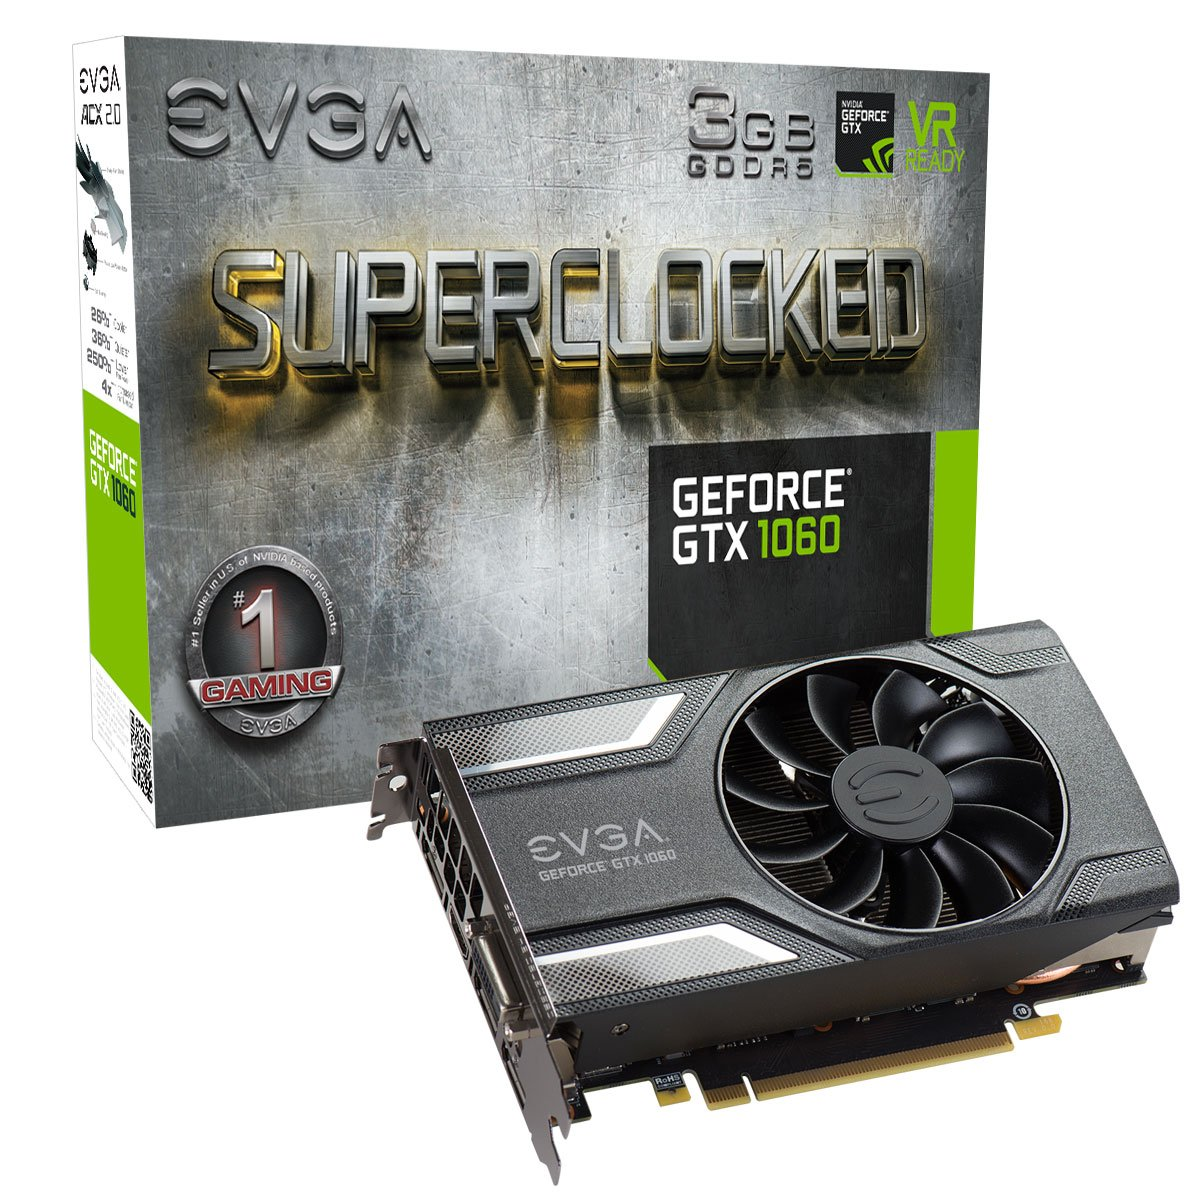 EVGA 03G-P4-6162-KR - Tarjeta gráfica (GeForce GTX 1060, 3 GB, GDDR5, 192 bit, 7680 x 4320 Pixeles, PCI Express x16 3.0): Amazon.es: Informática